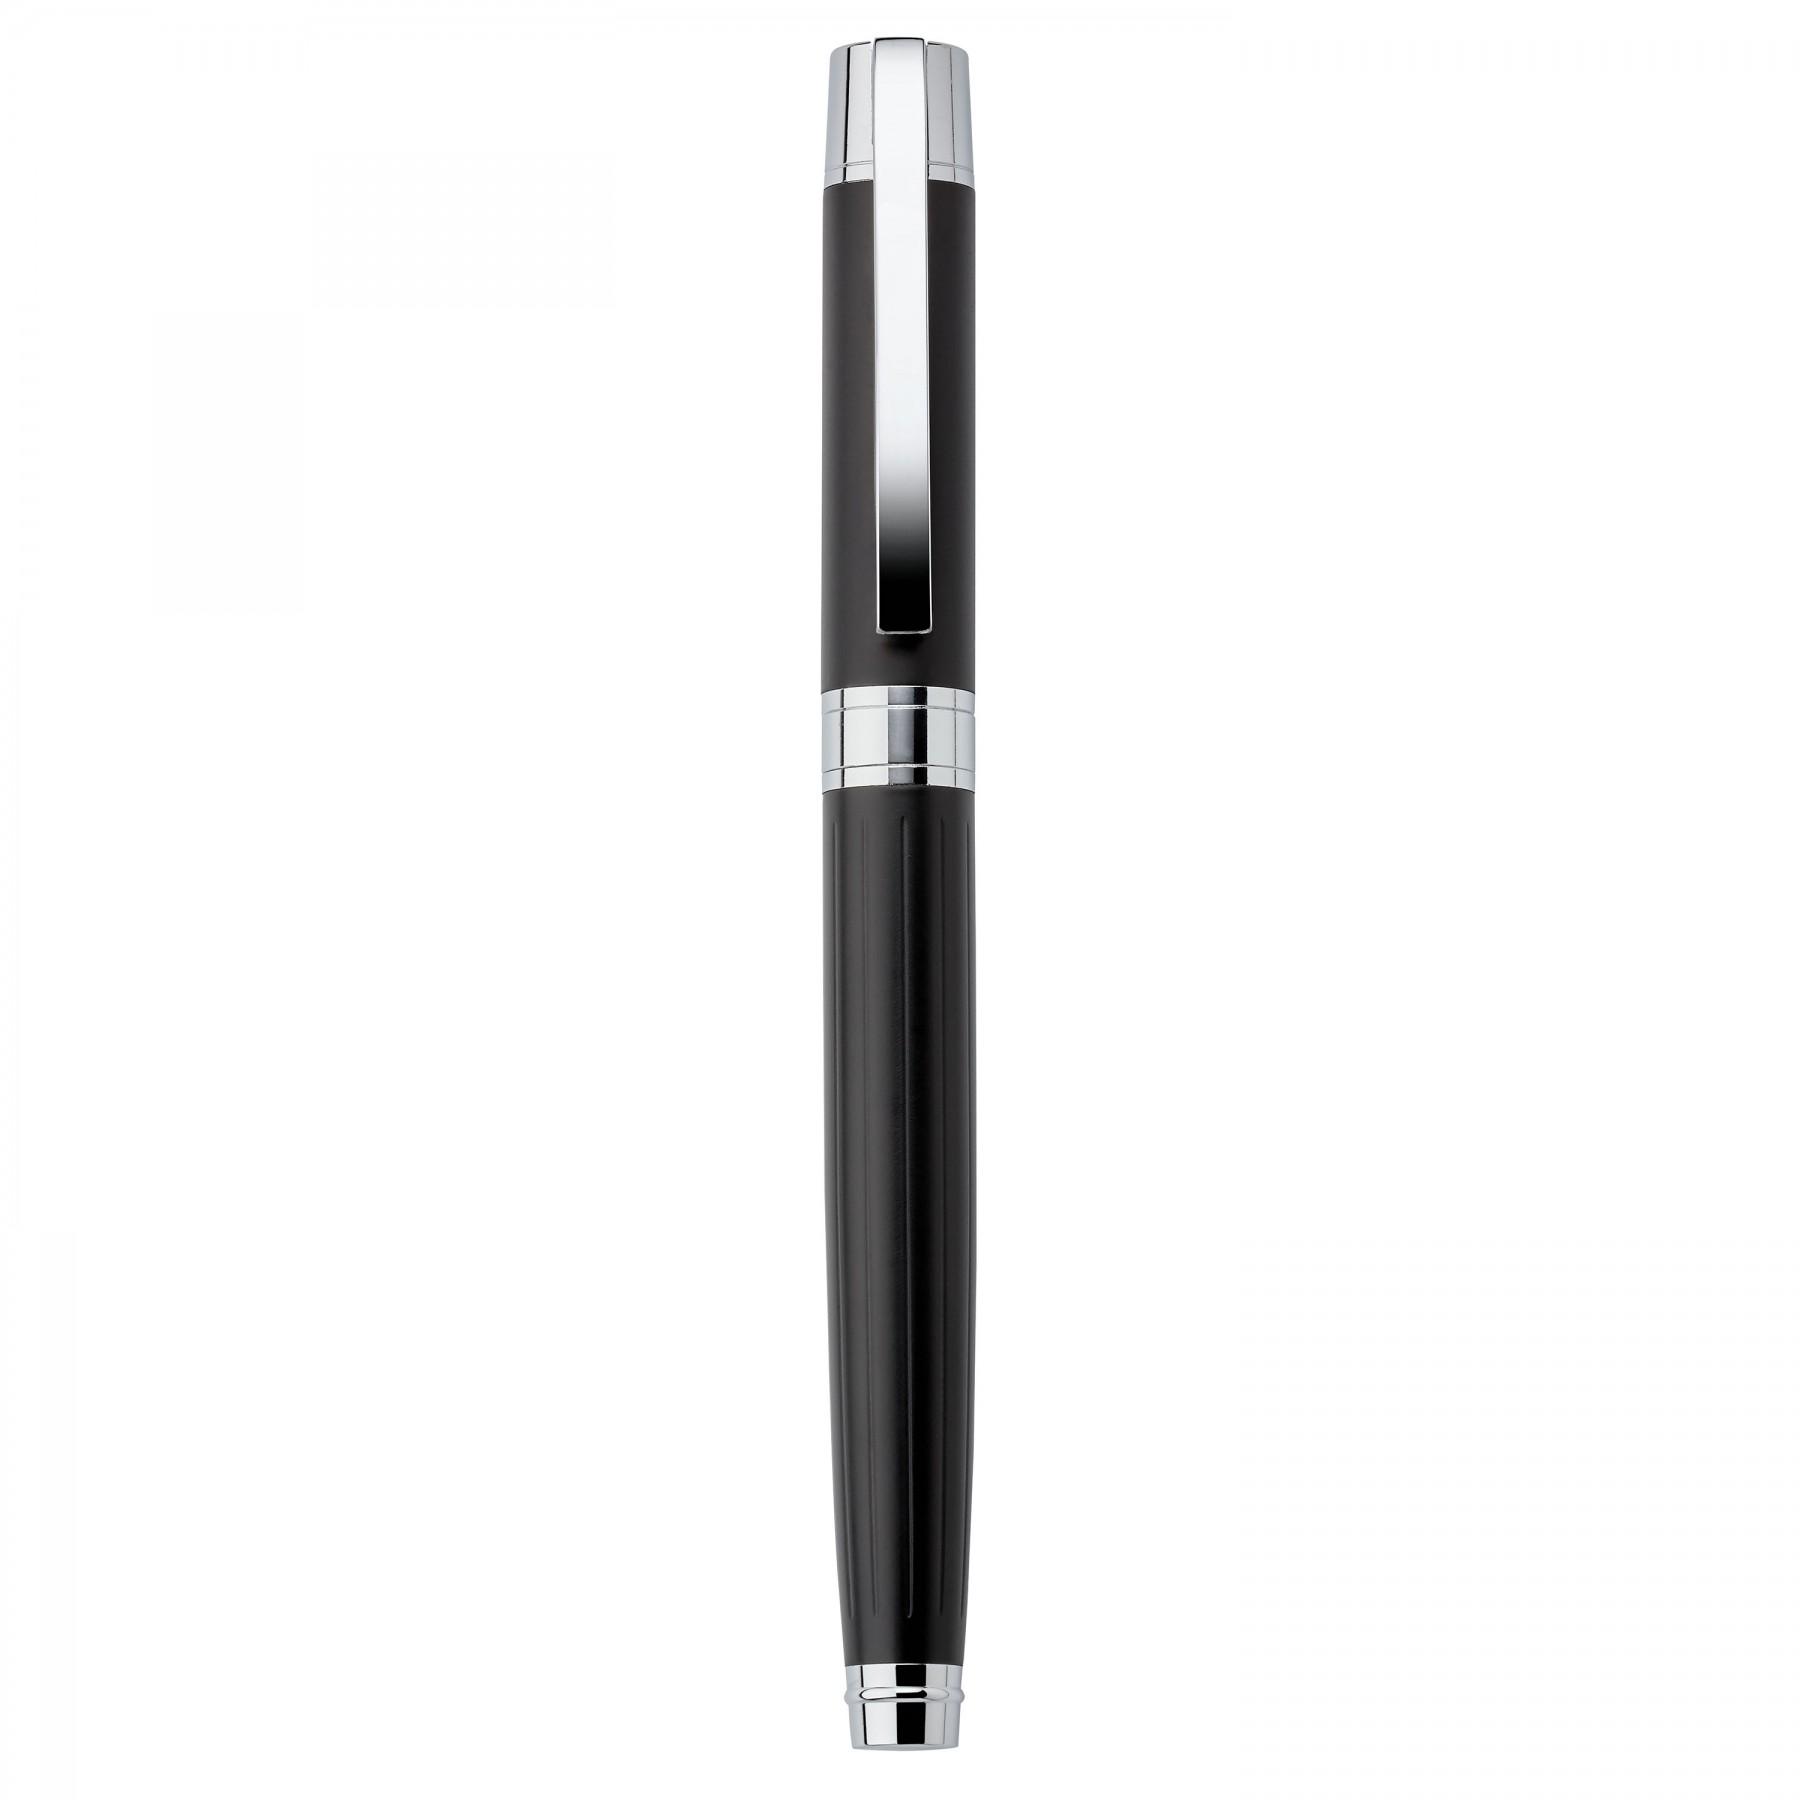 Duncan Rollerball, G3153, Laser Imprint